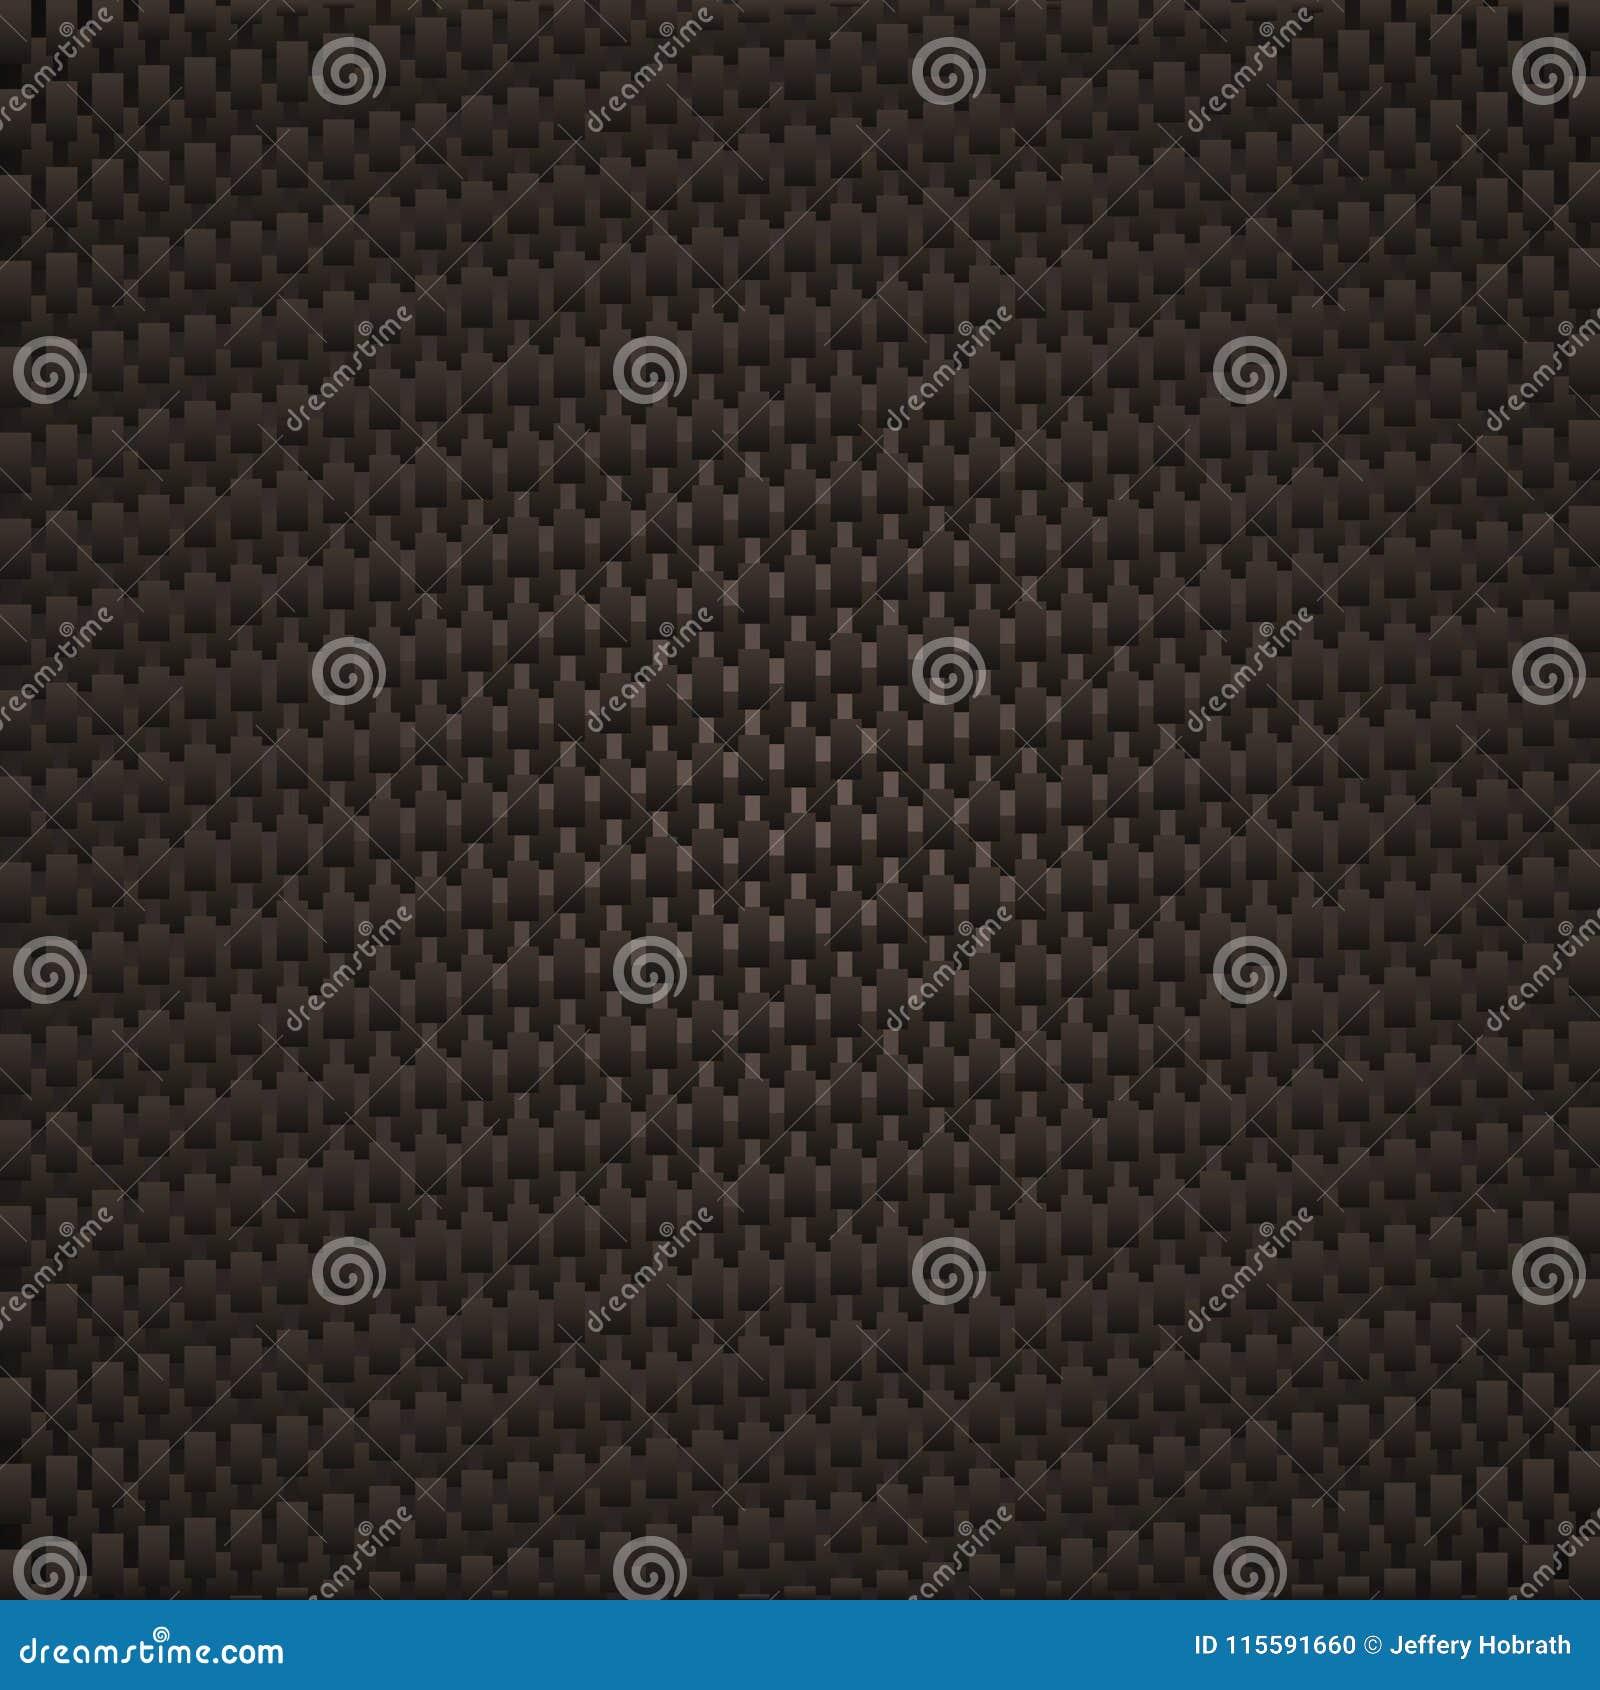 Kohlenstoff-Faser-Vektor-Grafik-Hintergrund